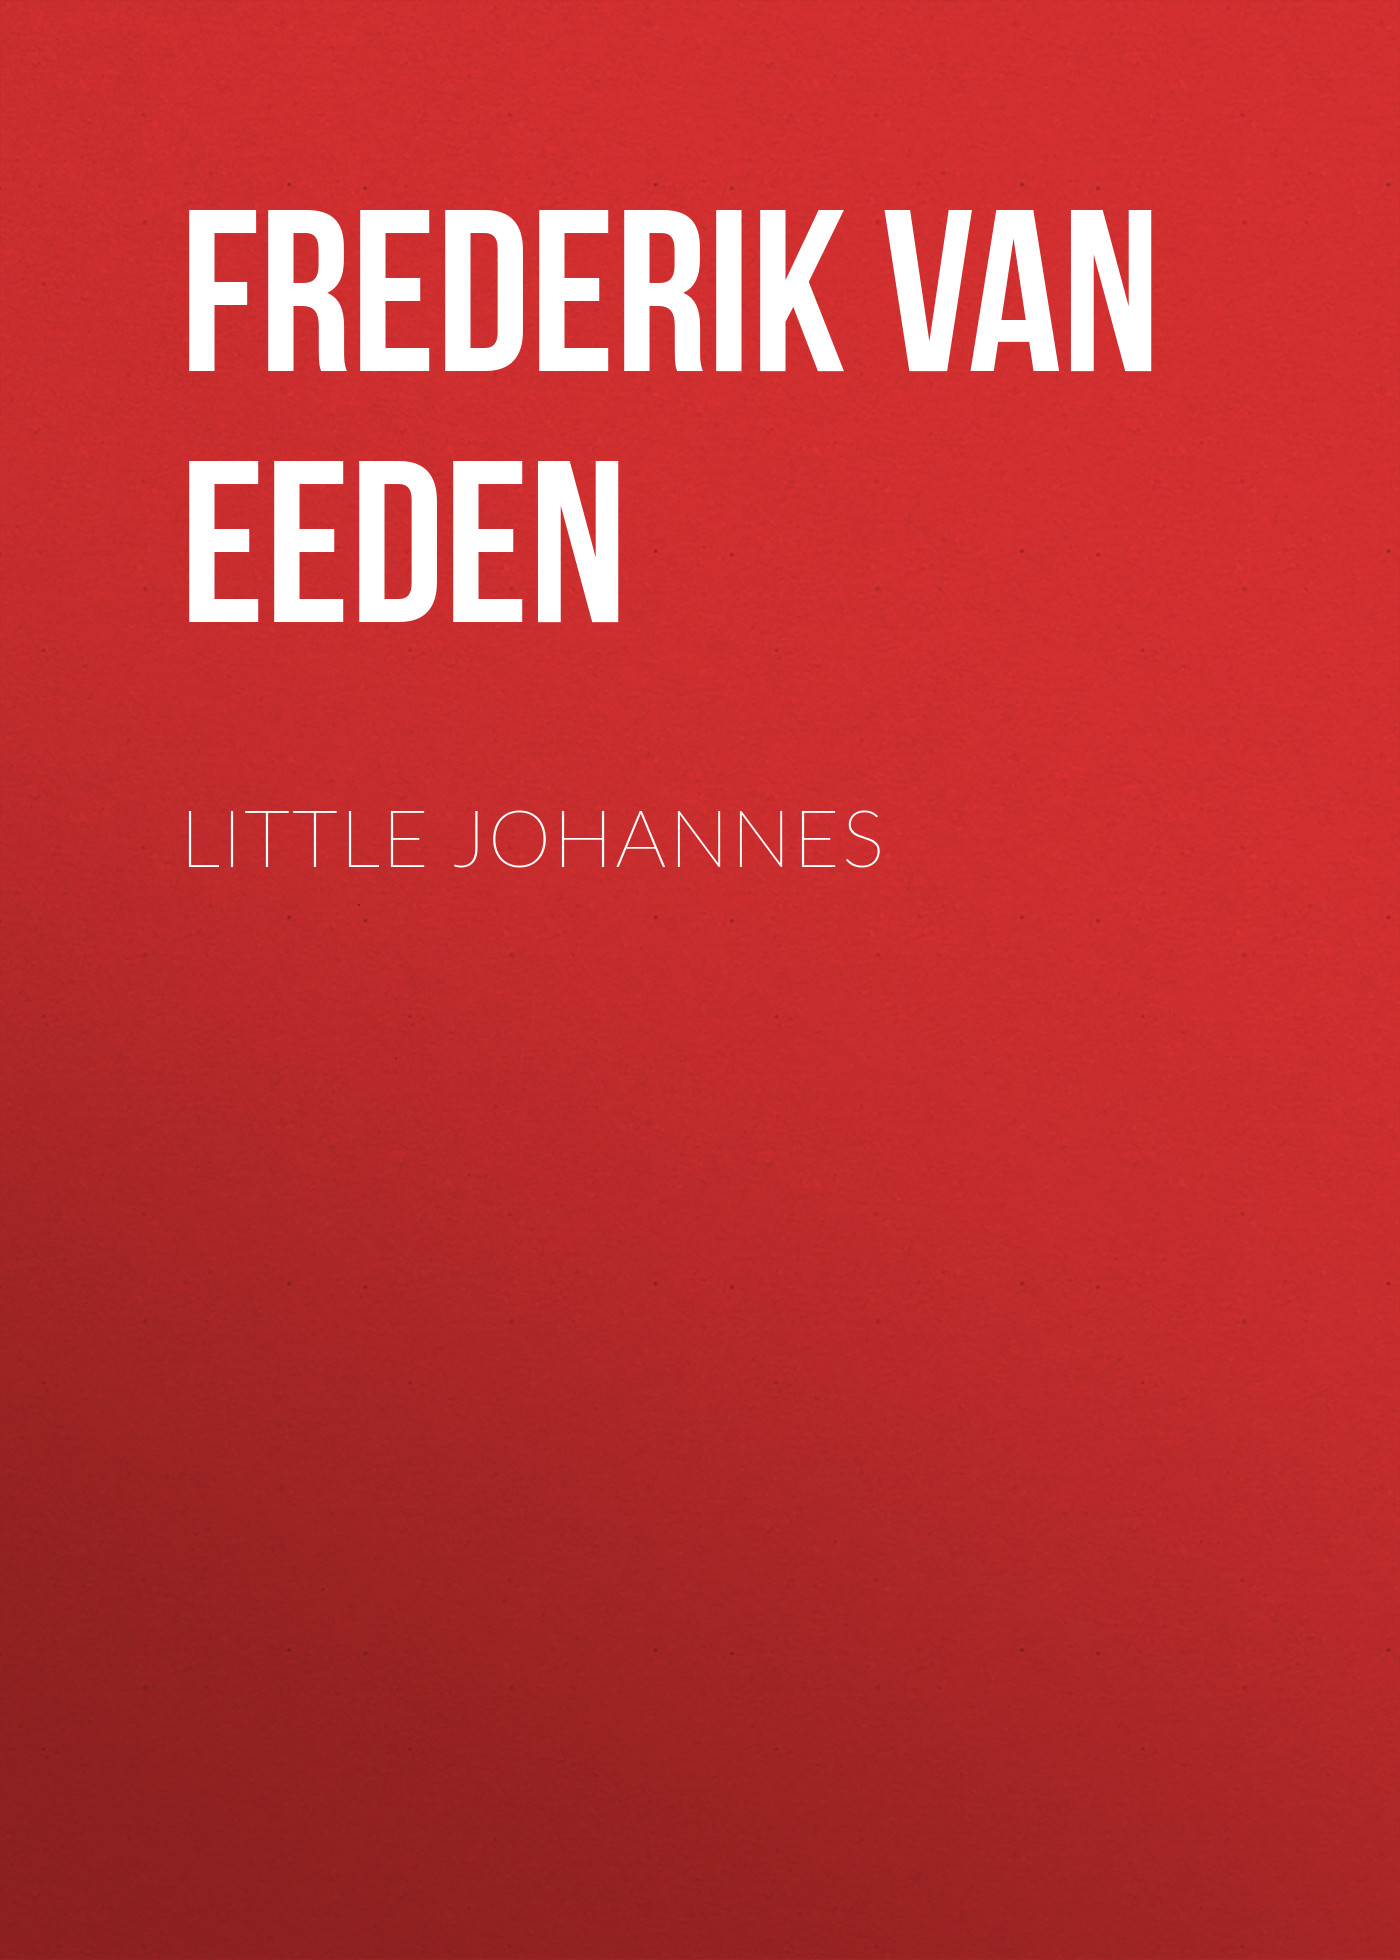 цена на Frederik van Eeden Little Johannes